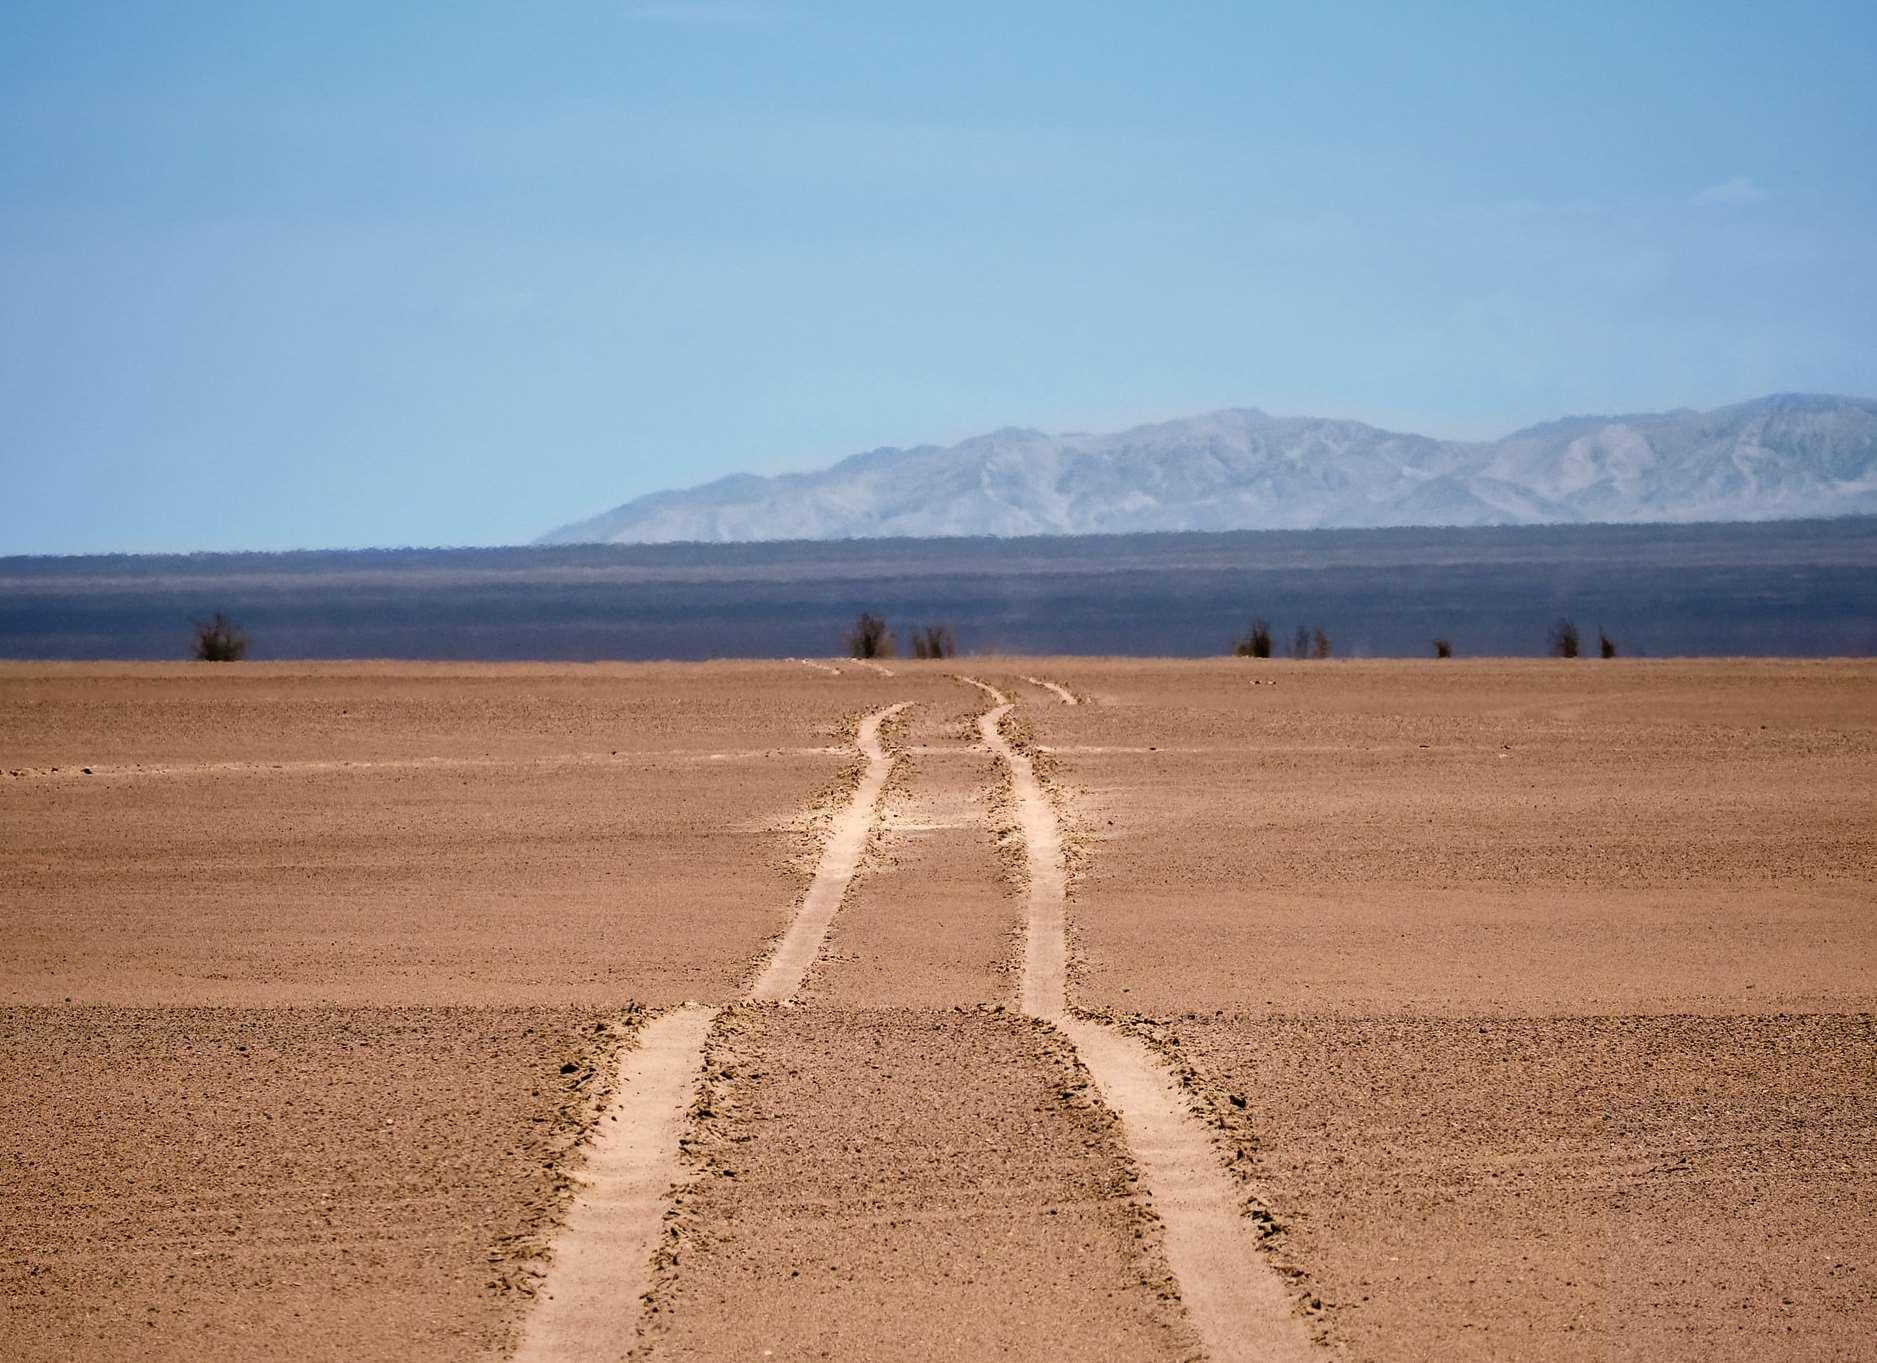 Mirage in desert